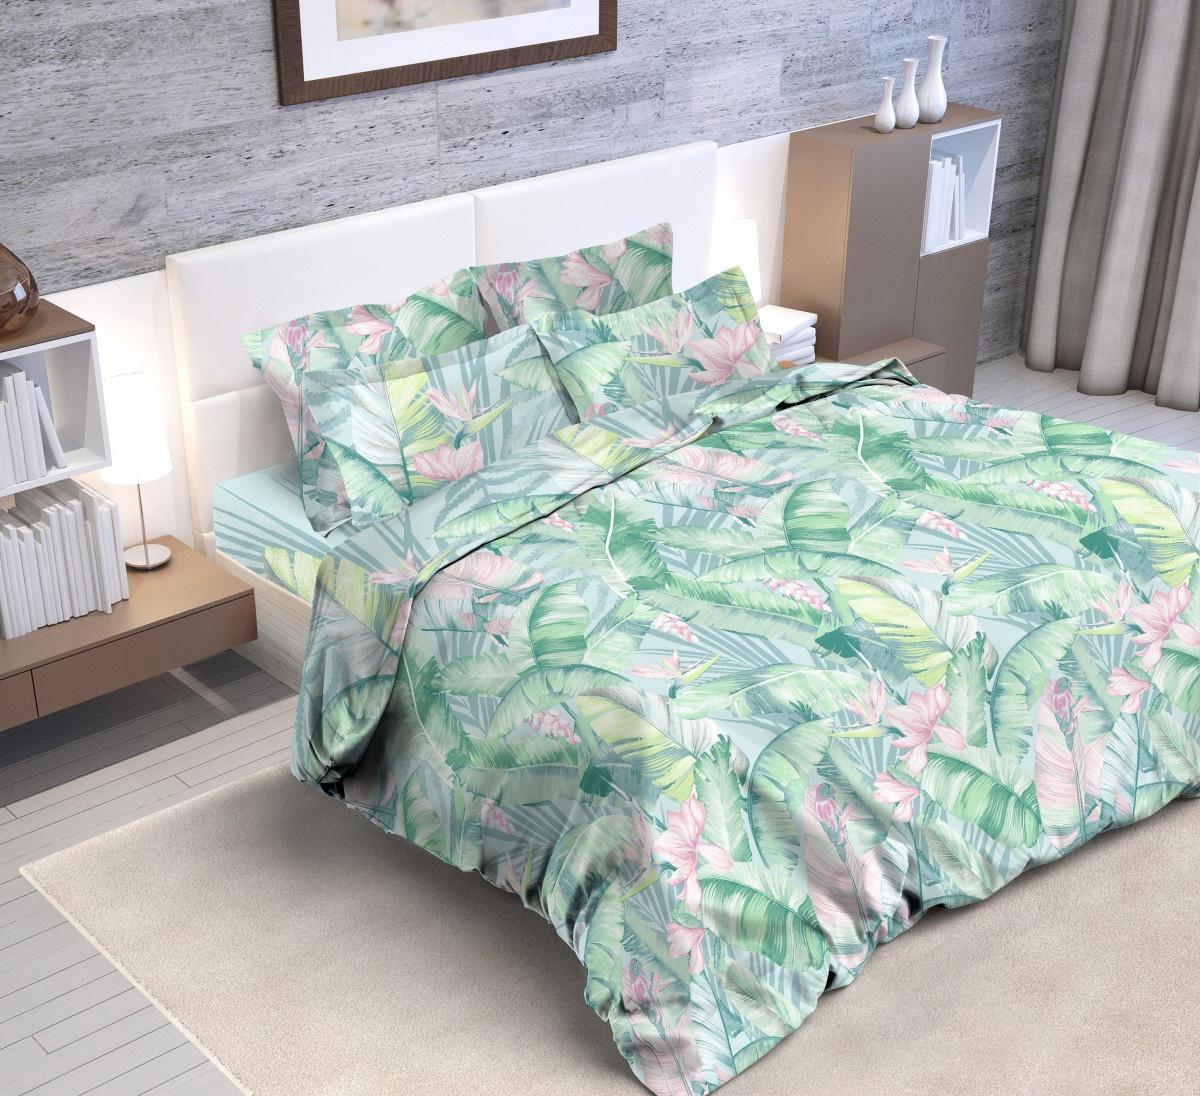 Комплект постельного белья Butterfly Поплин евро, 2 нав 70*70, прост 220*240, подод 200*220 (ПК3) рис. 9115/1 falcon